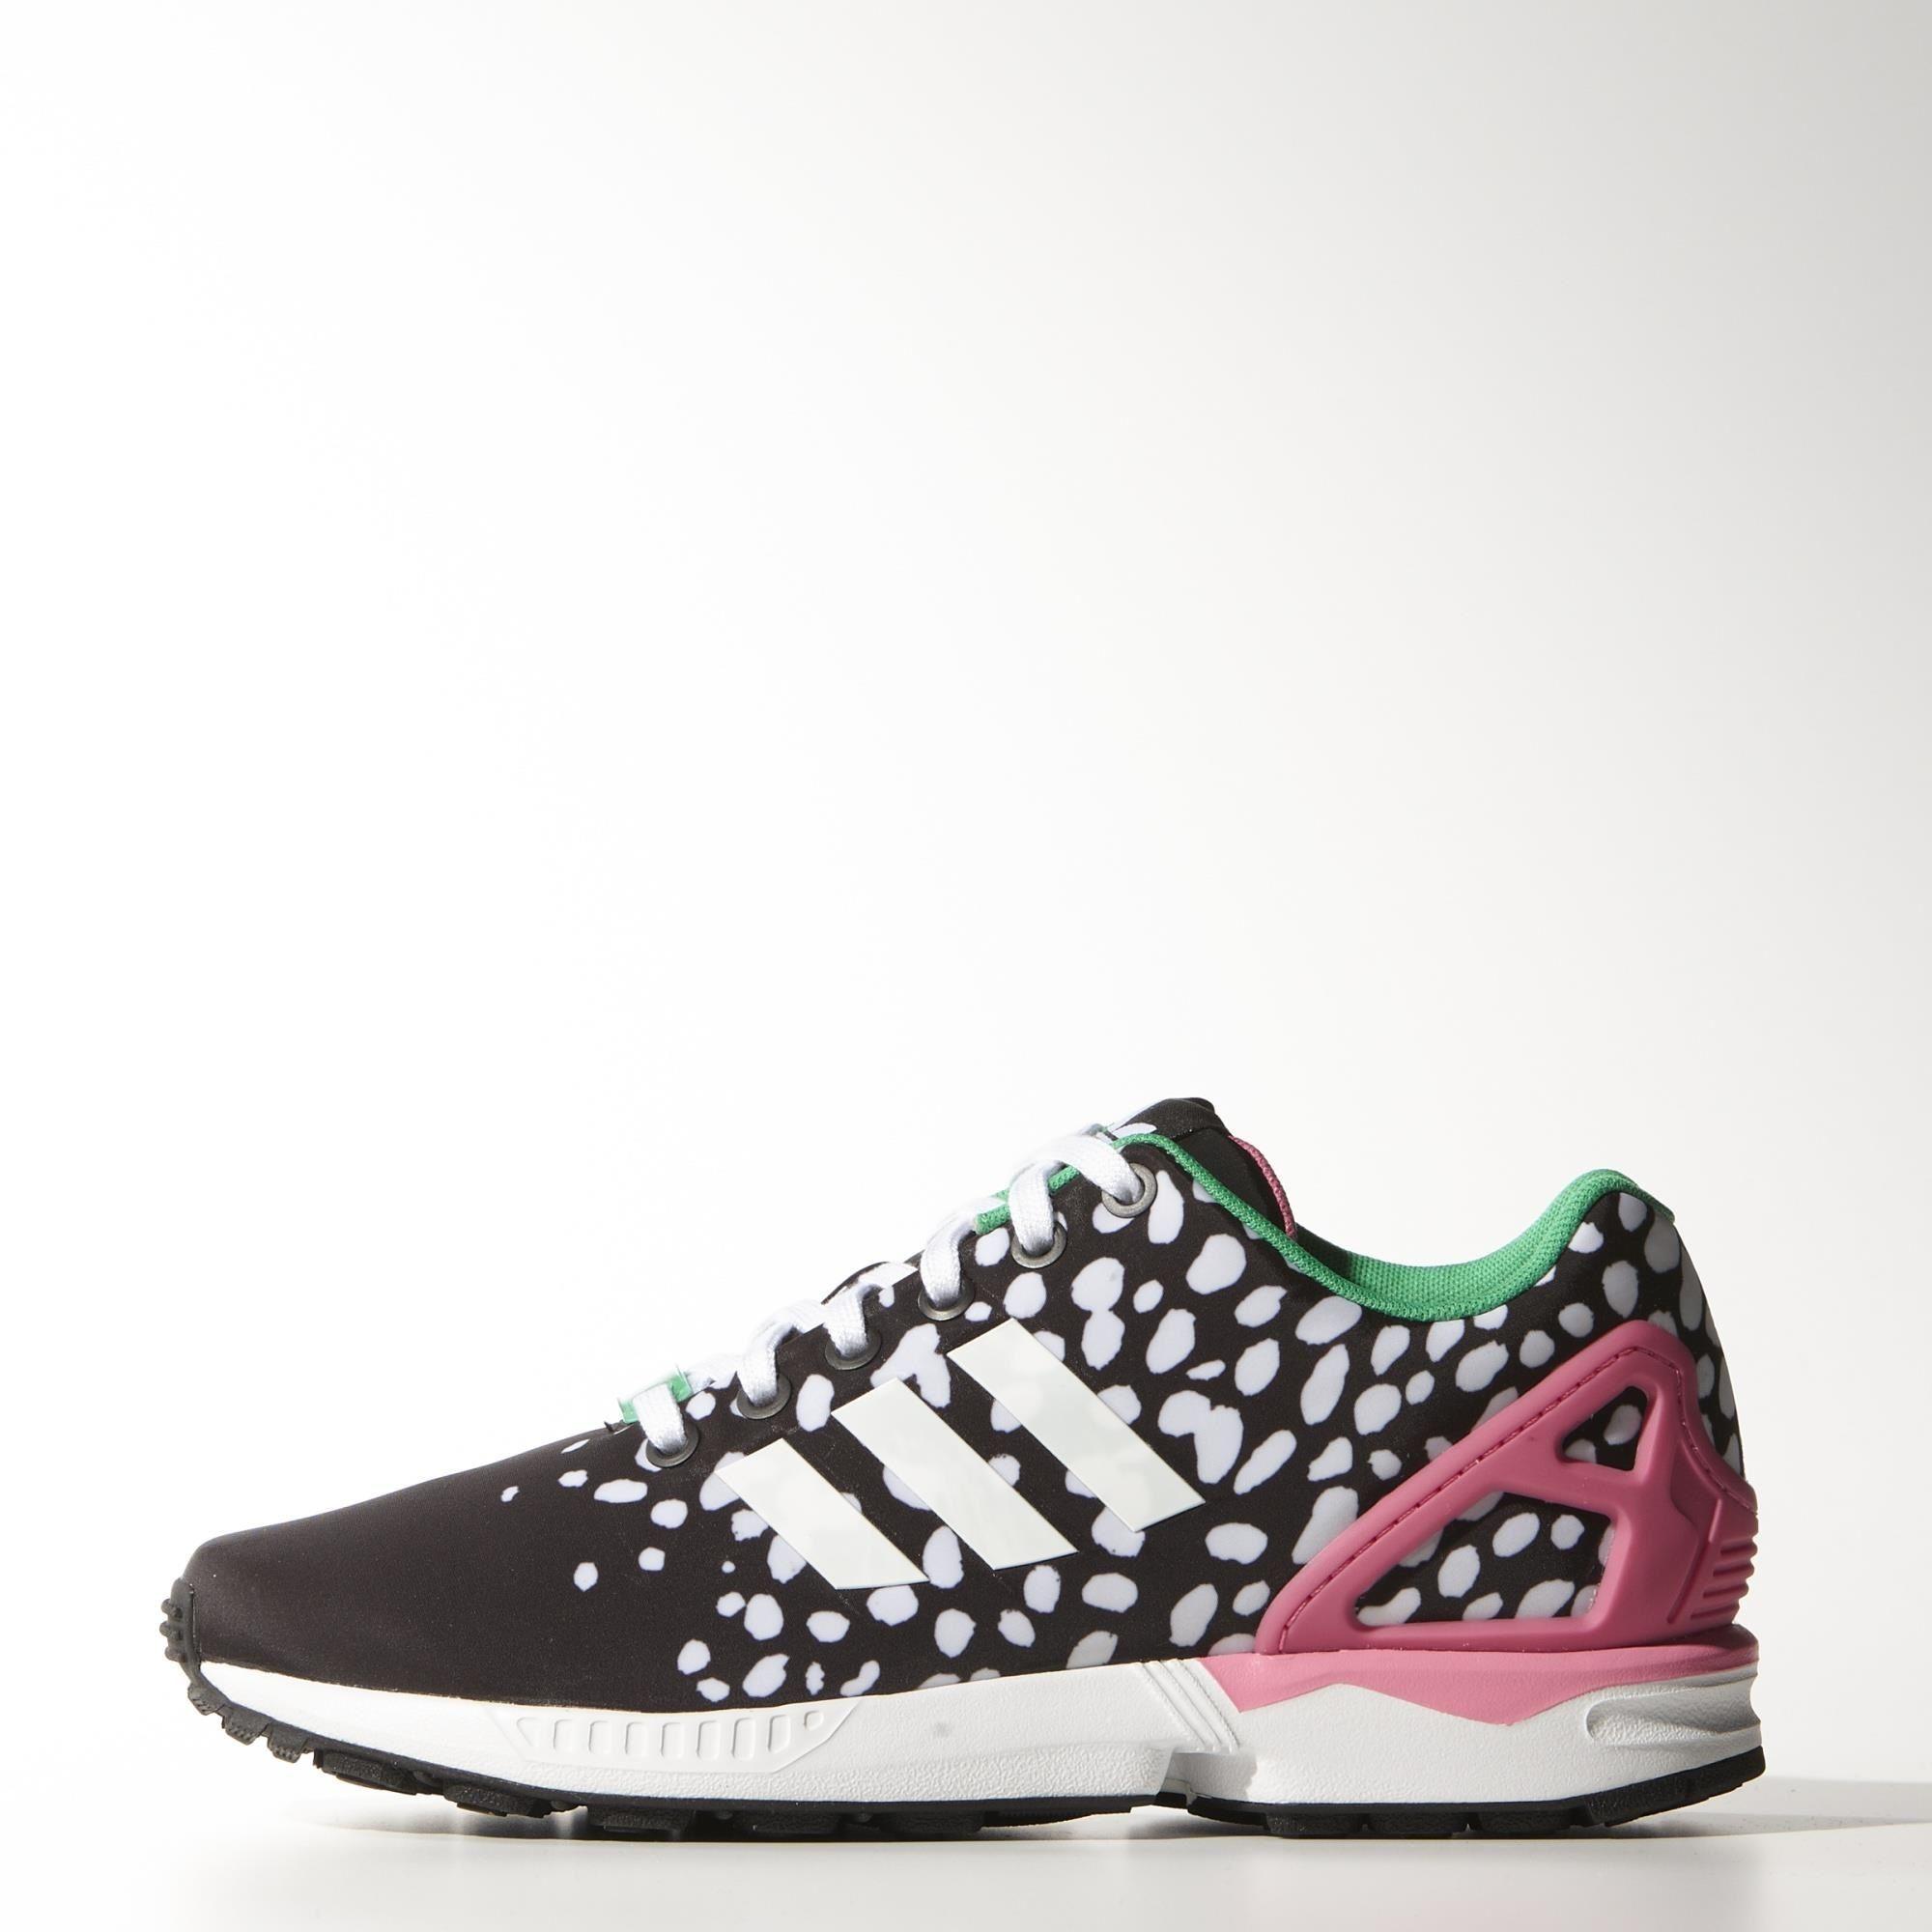 buy online b64c6 db832 ... adidas - ZX Flux Schuh ...